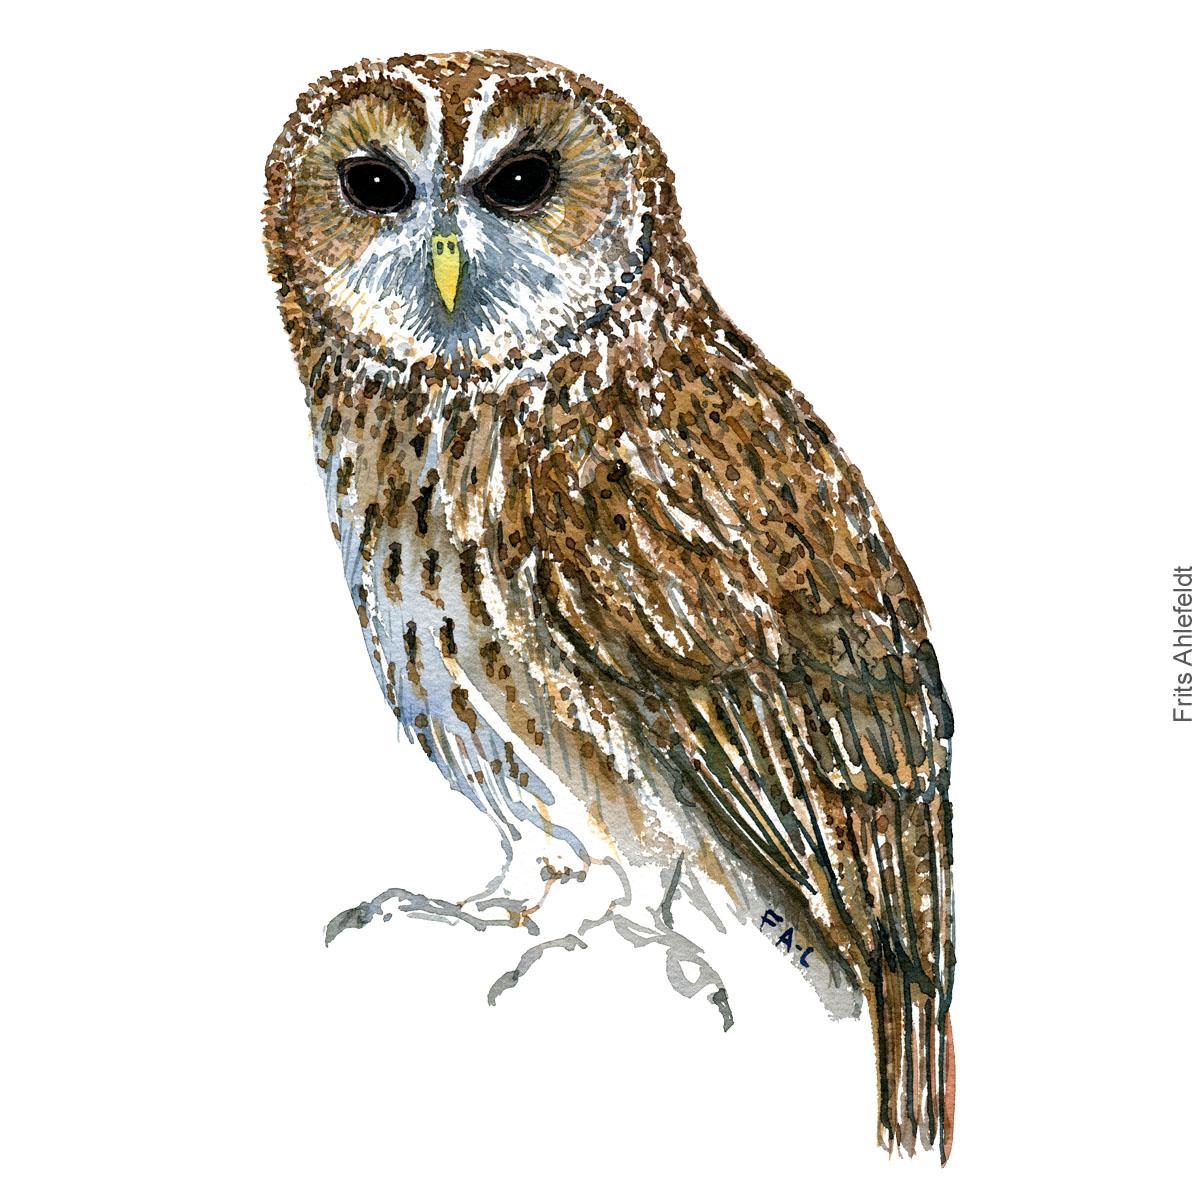 Tawny owl - Natugle Akvarel. Watercolor bird illustration by Frits Ahlefeldt